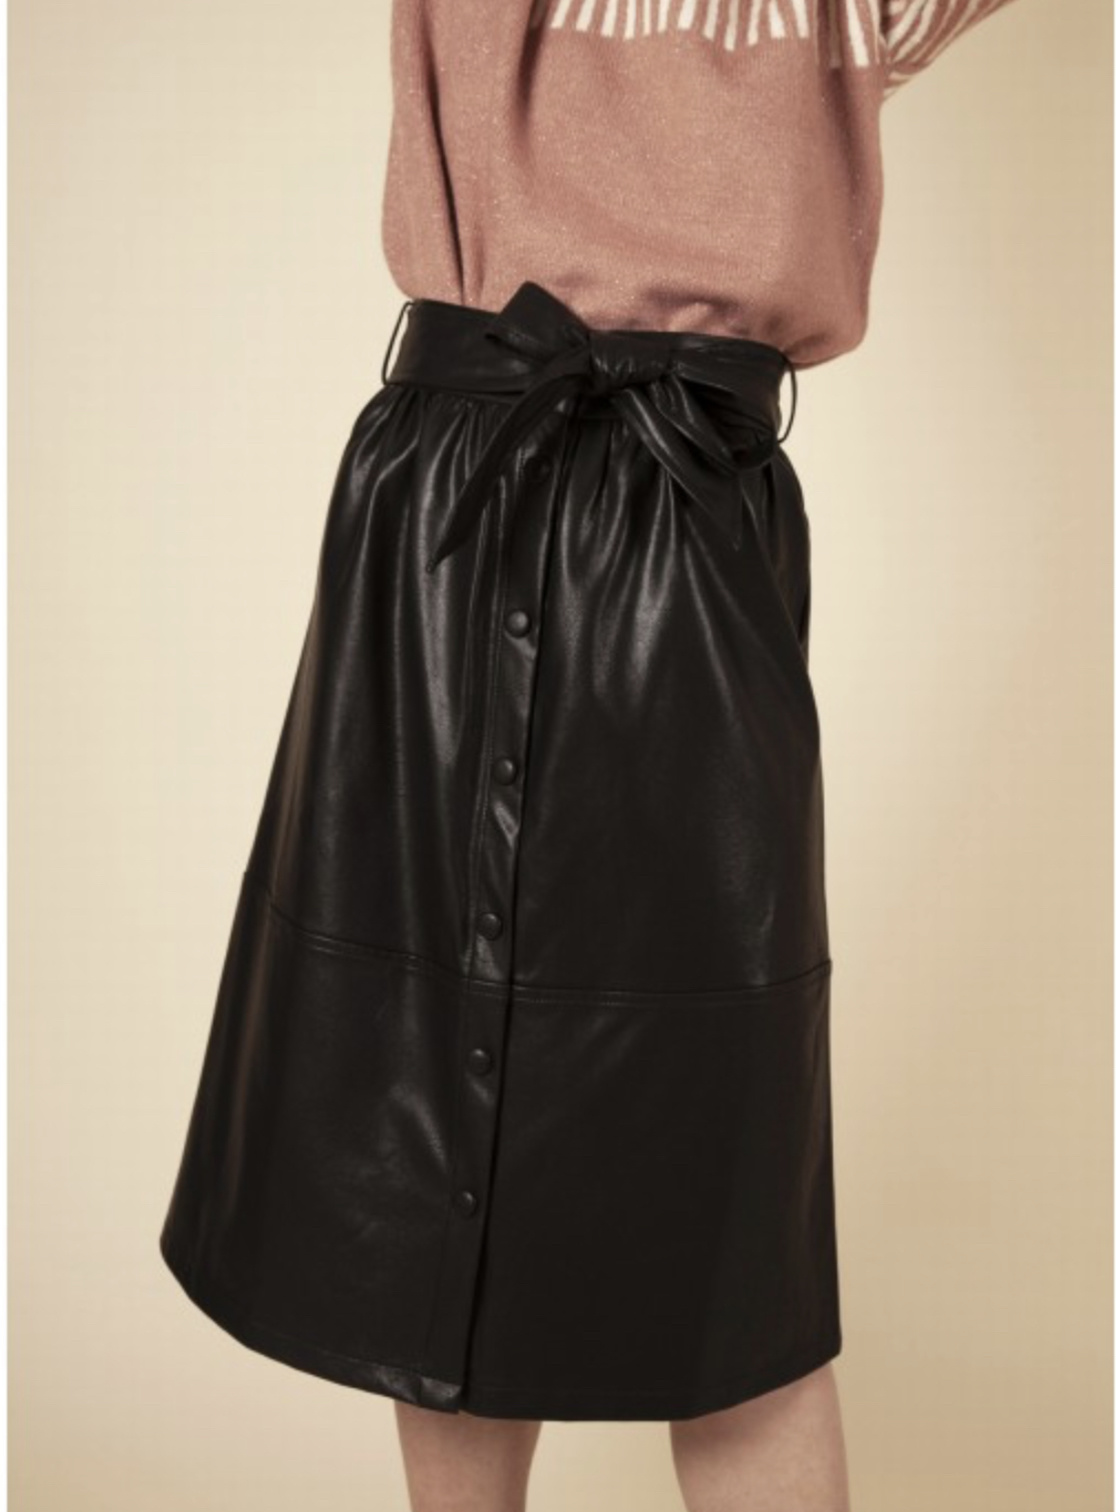 FRNCH Ermine - Vegan Leather Skirt